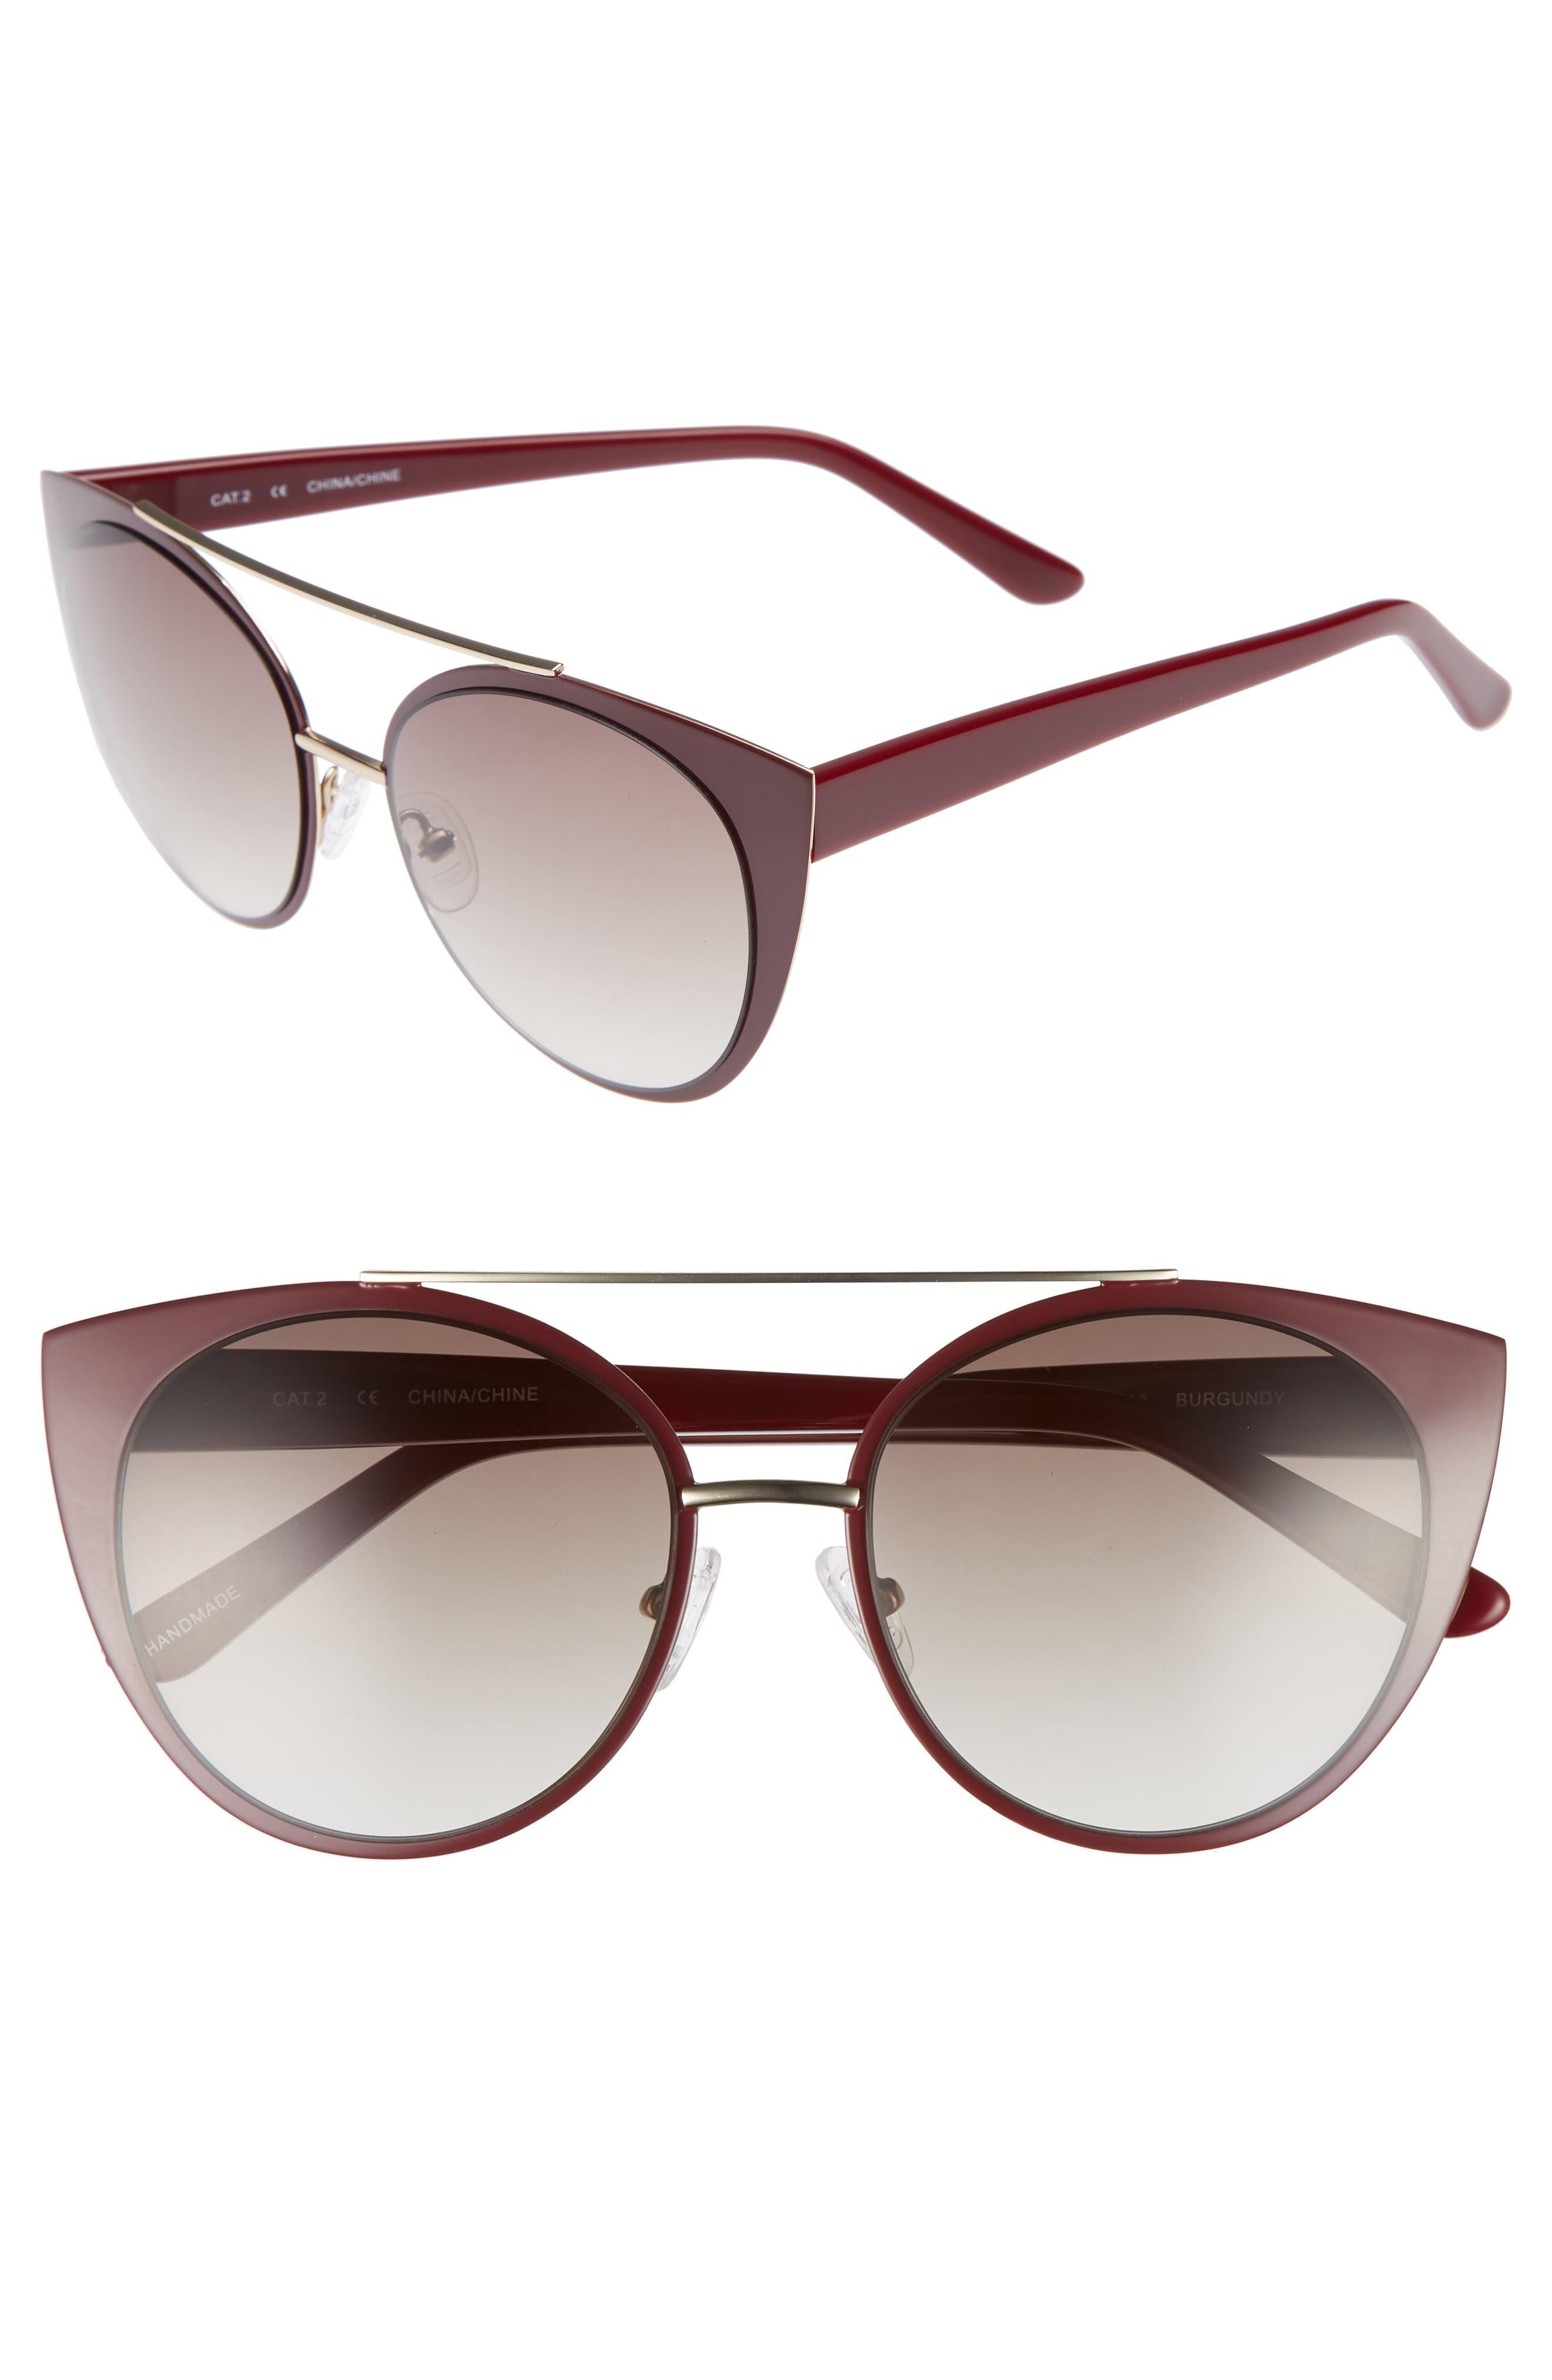 Amelia 53mm Aviator Sunglasses,                         Main,                         color, 930